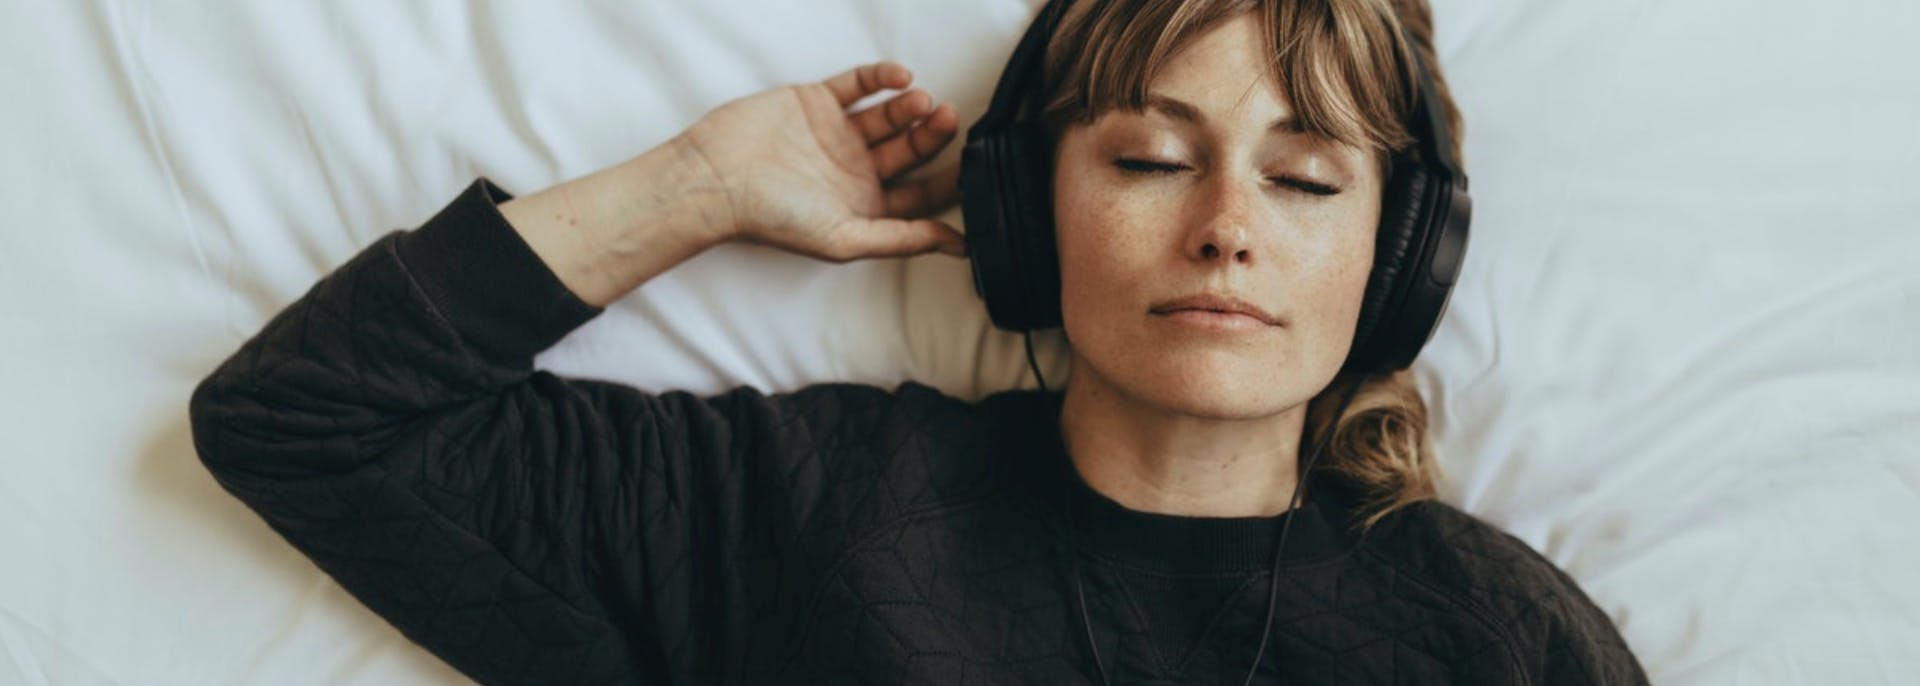 Girl lying on bed with headphones on